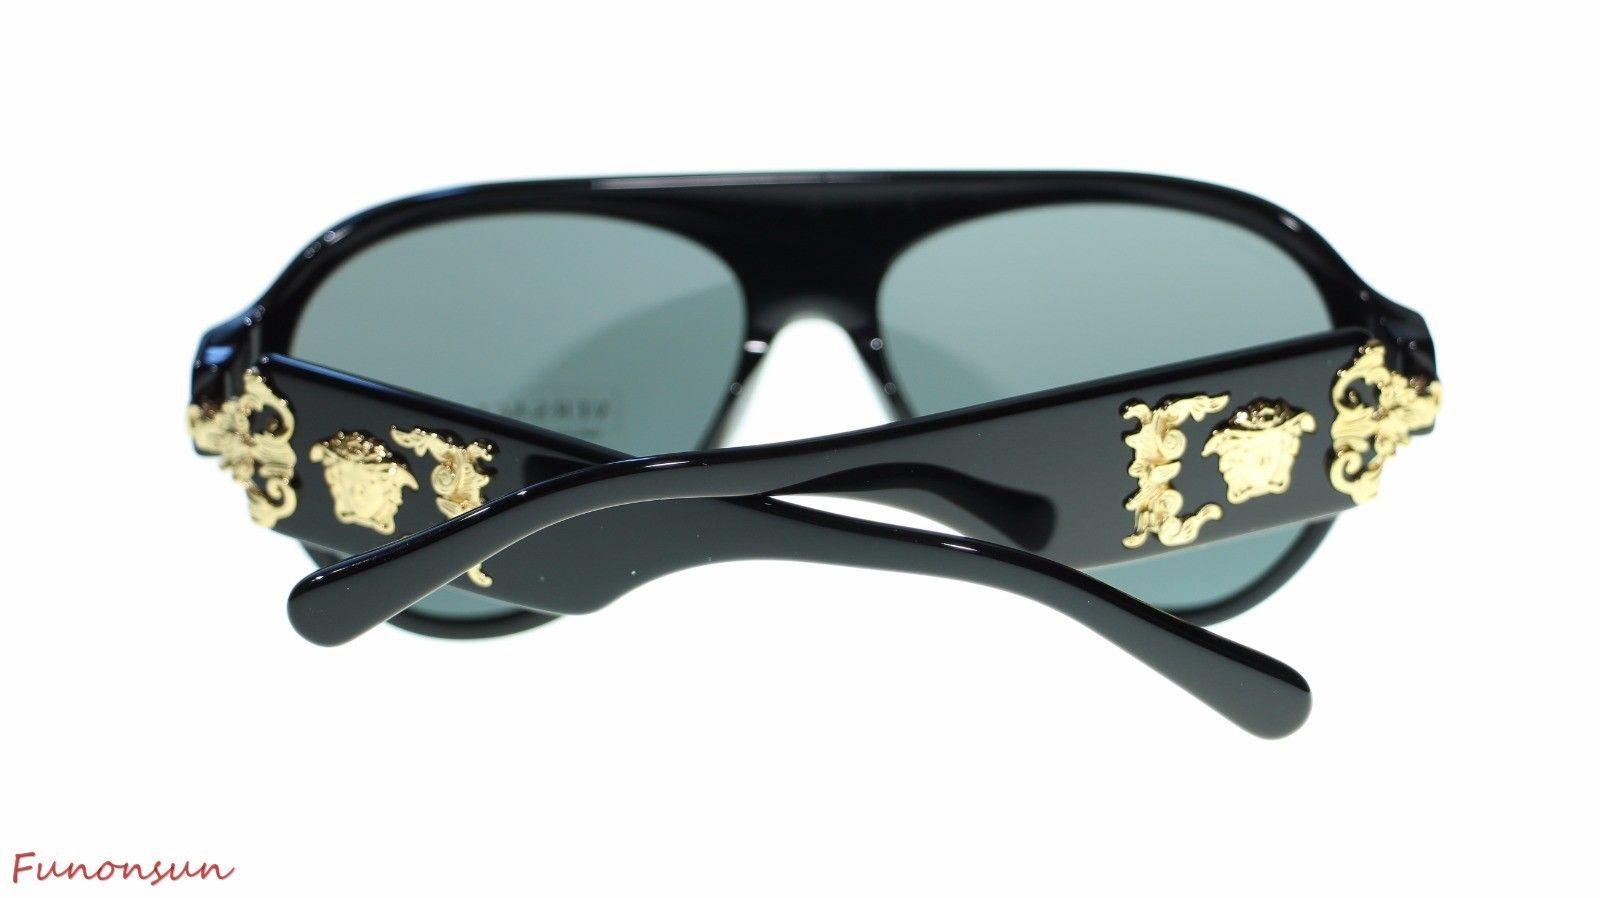 c0fe30b8ecf62 Versace Men s Pilot Sunglasses VE4323 GB1 87 Black Grey Lens 58mm Authentic